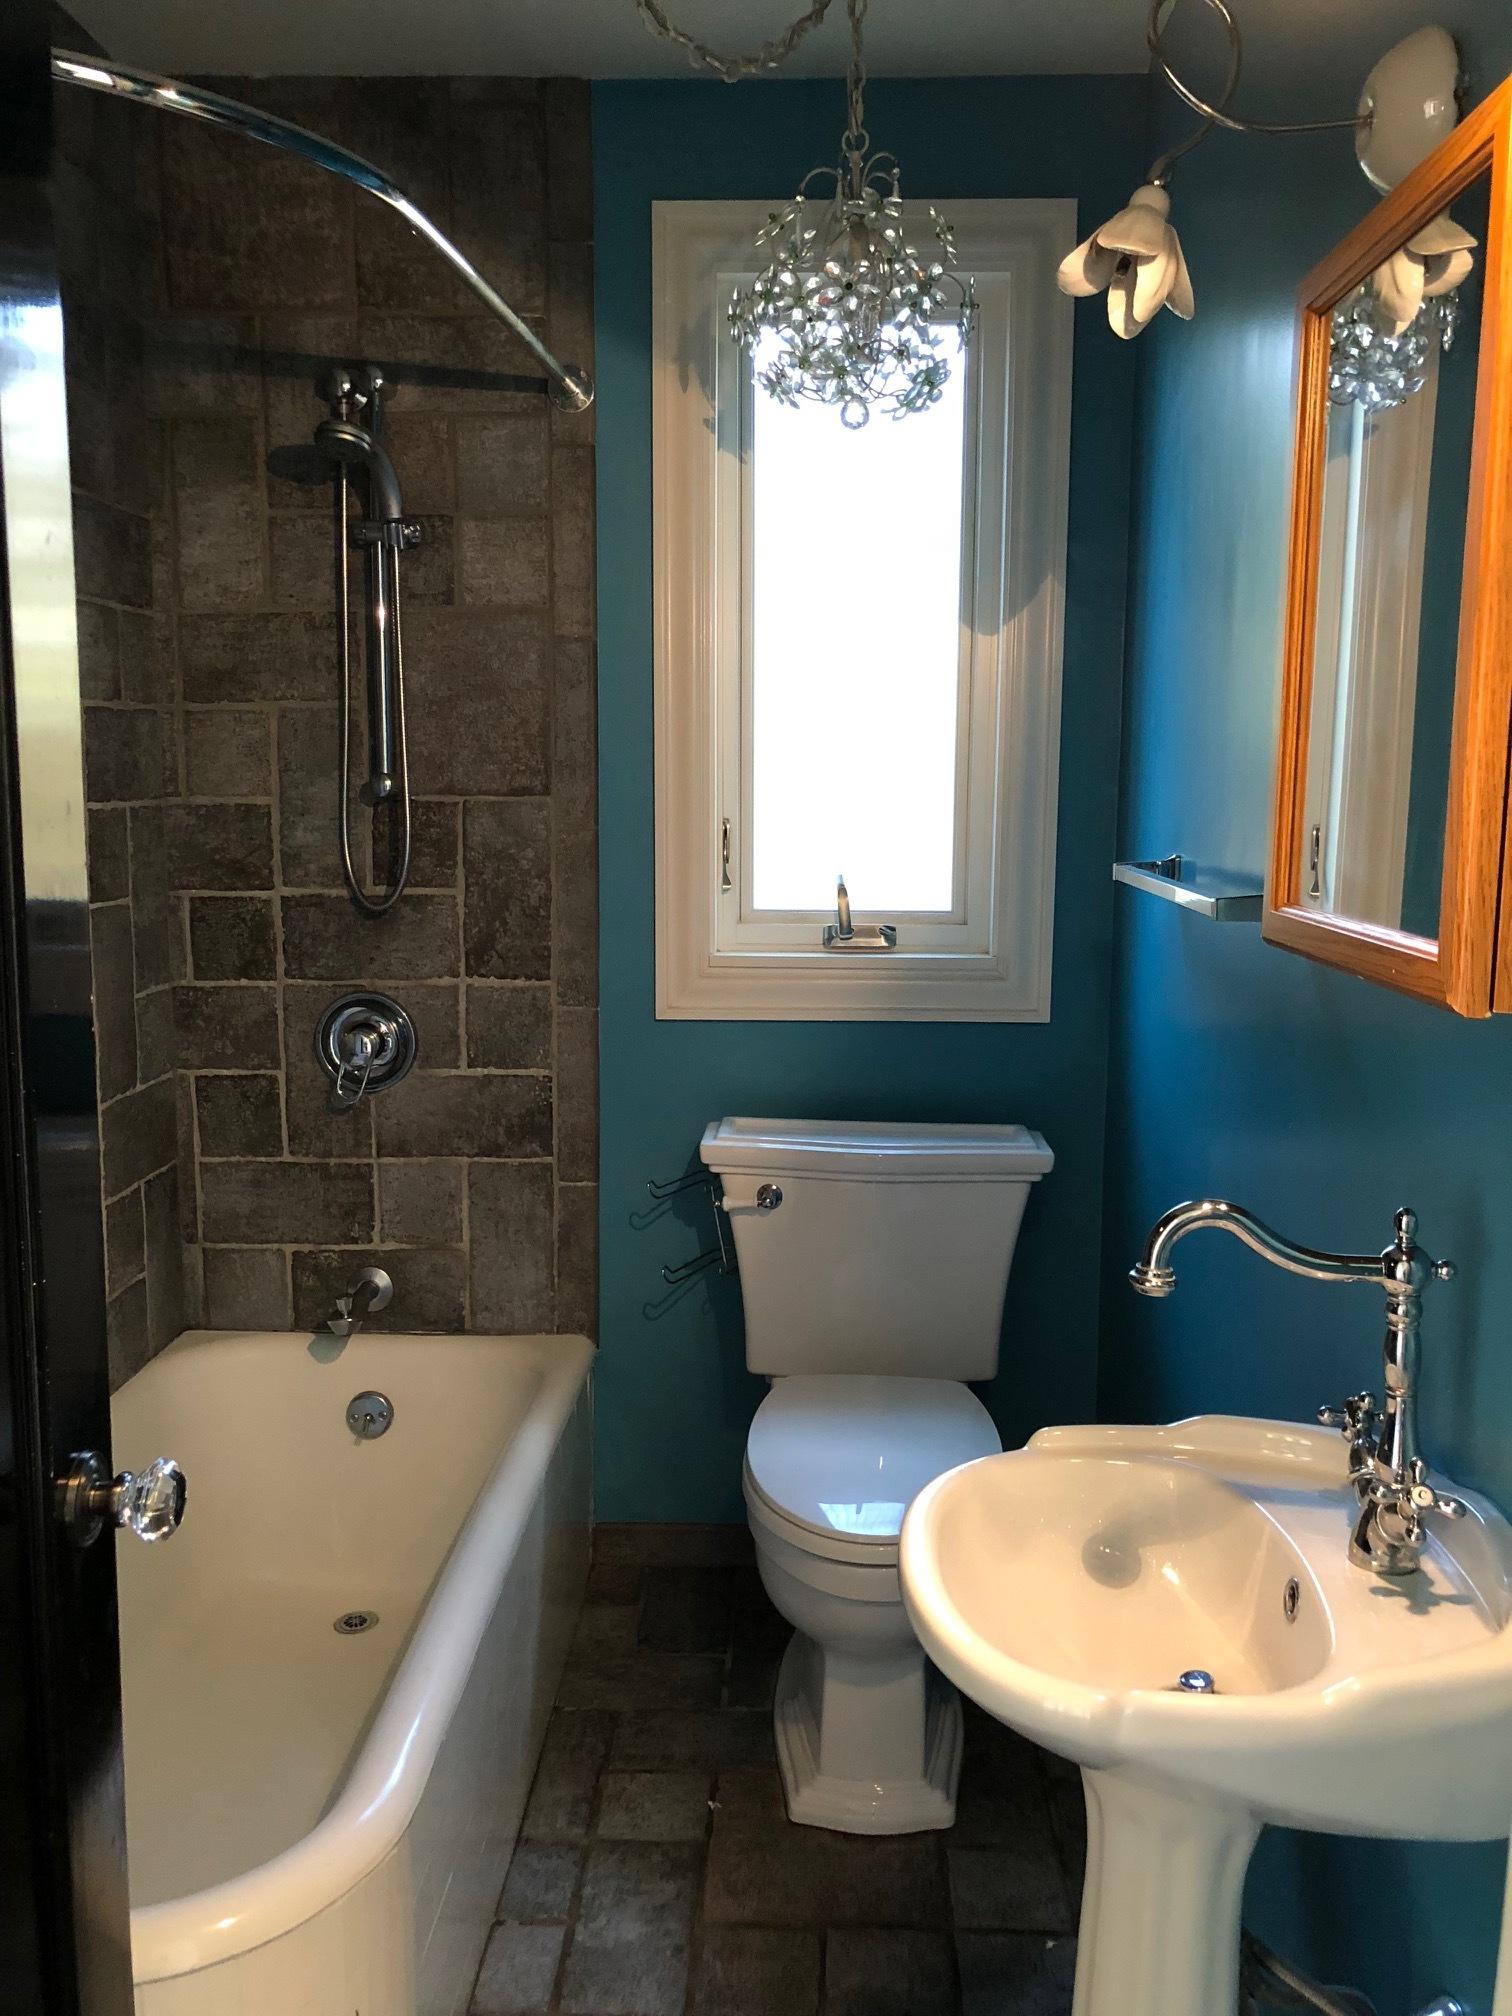 Crocker Highlands Modern Mediterranean Bathroom Renovation, Interior Design and Staging- before